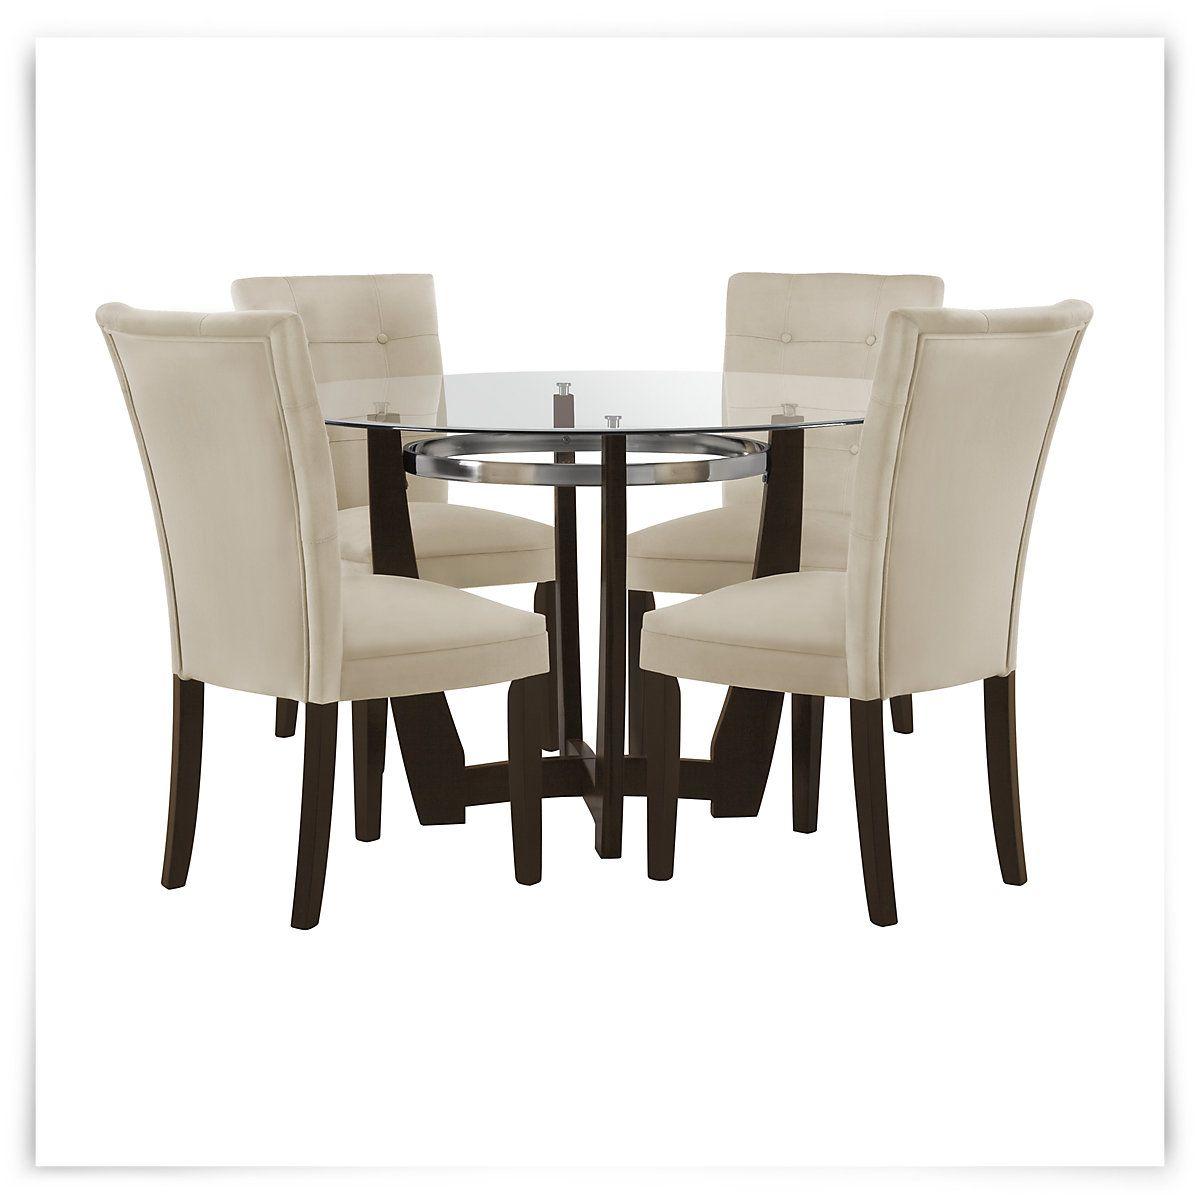 Matinee Dark Tone Round Table & 4 Upholstered Chairs